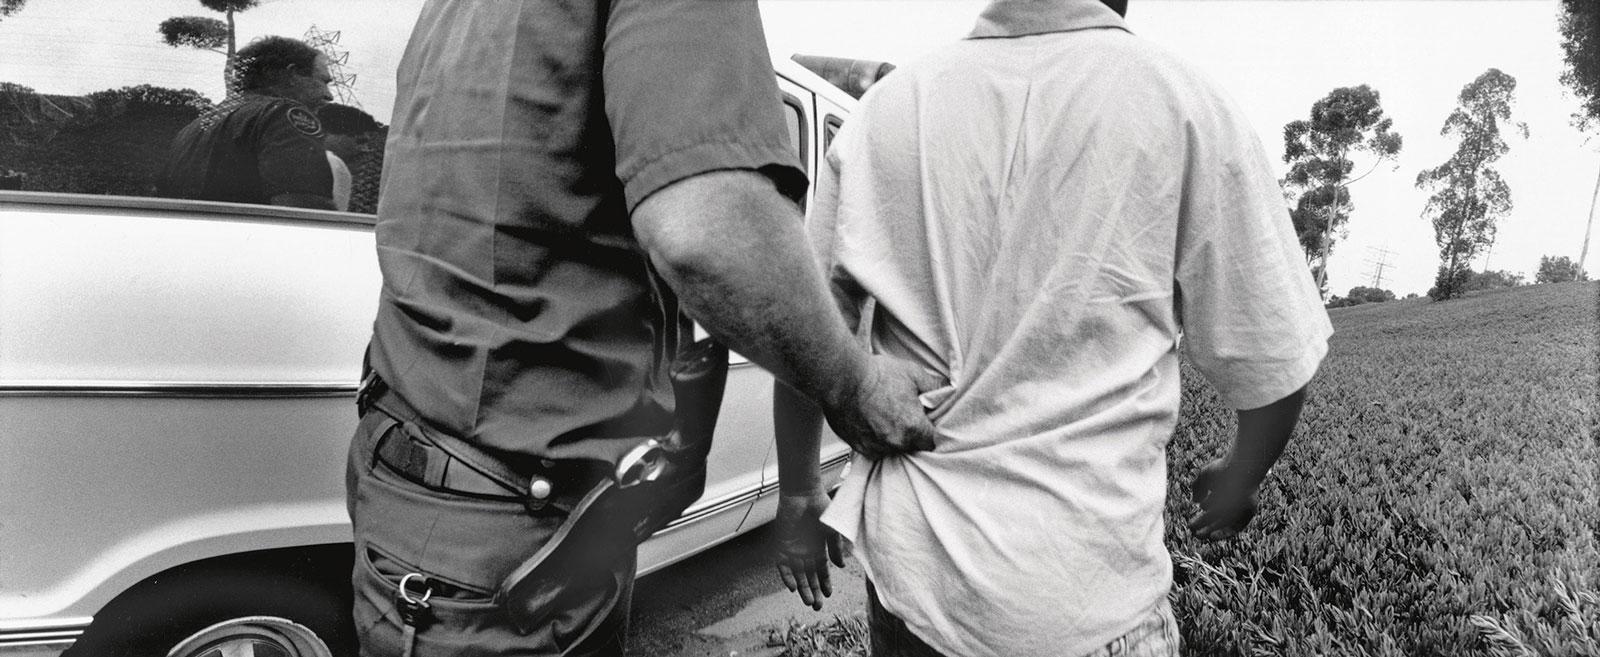 meiselas-arrest-california